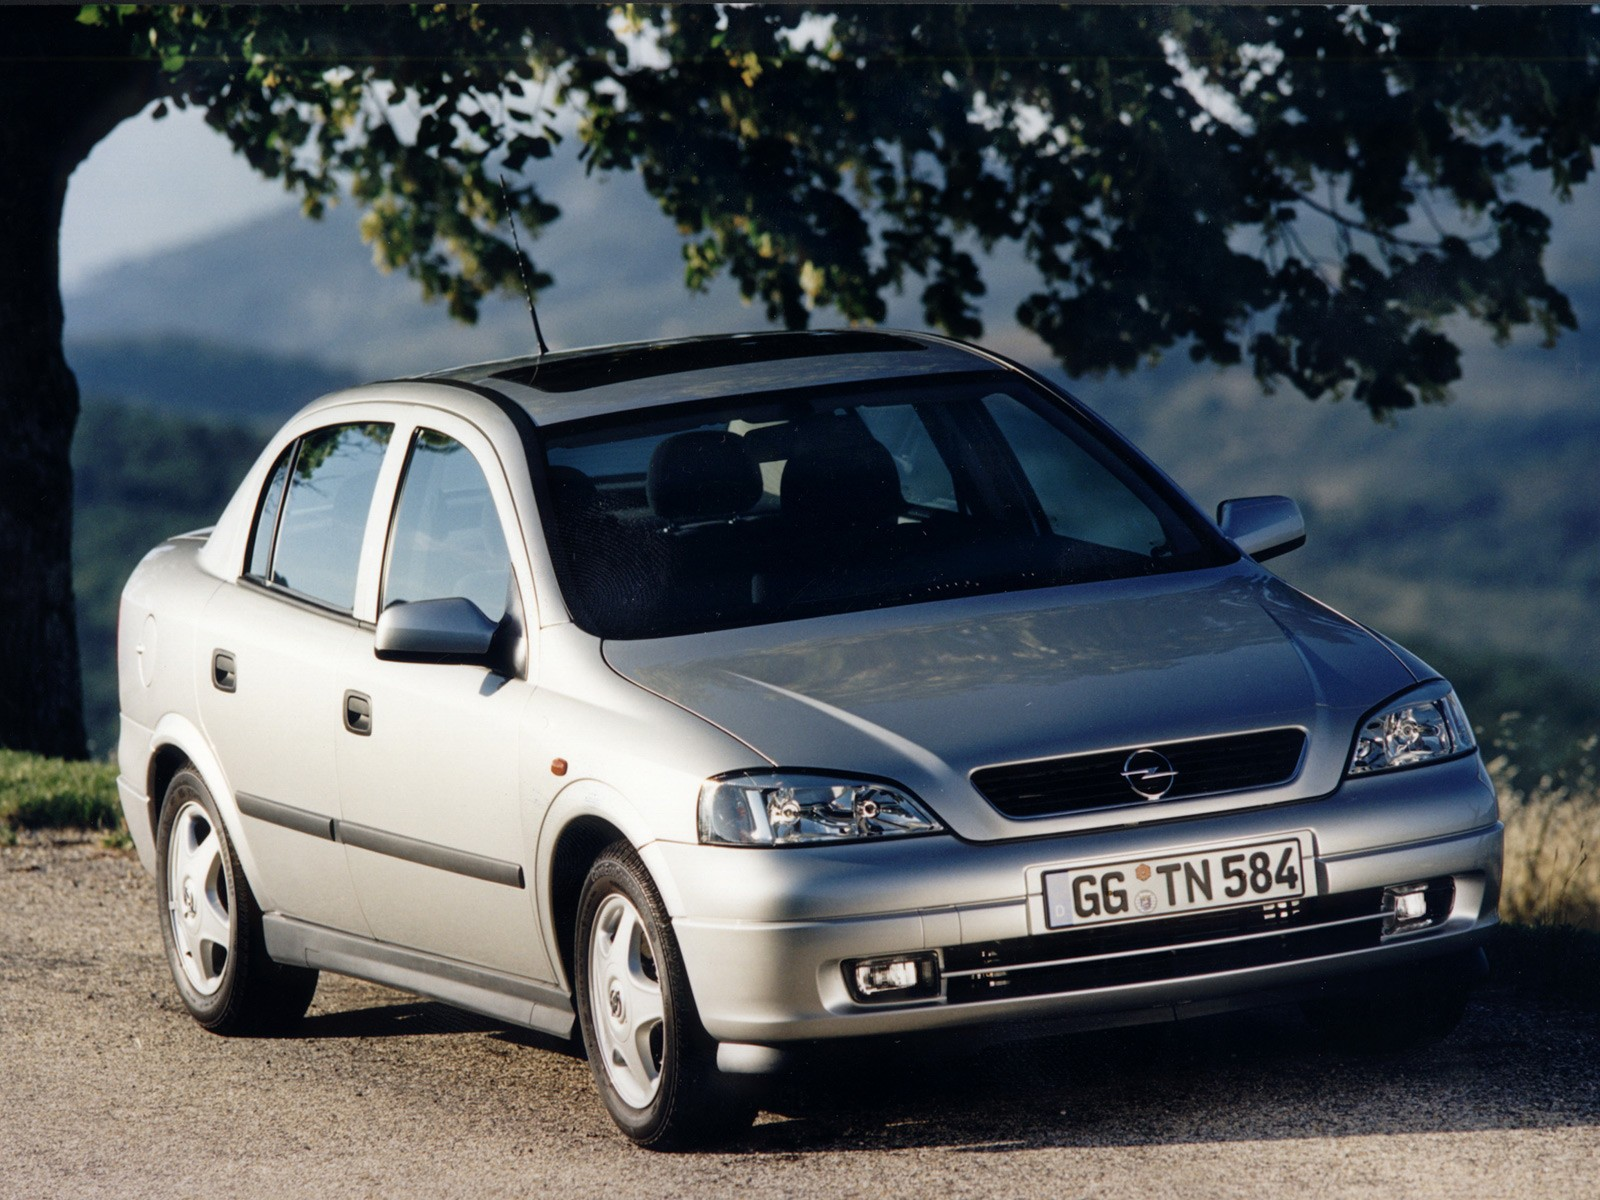 Opel Astra - opel astra sw benzina usate - Mitula Auto